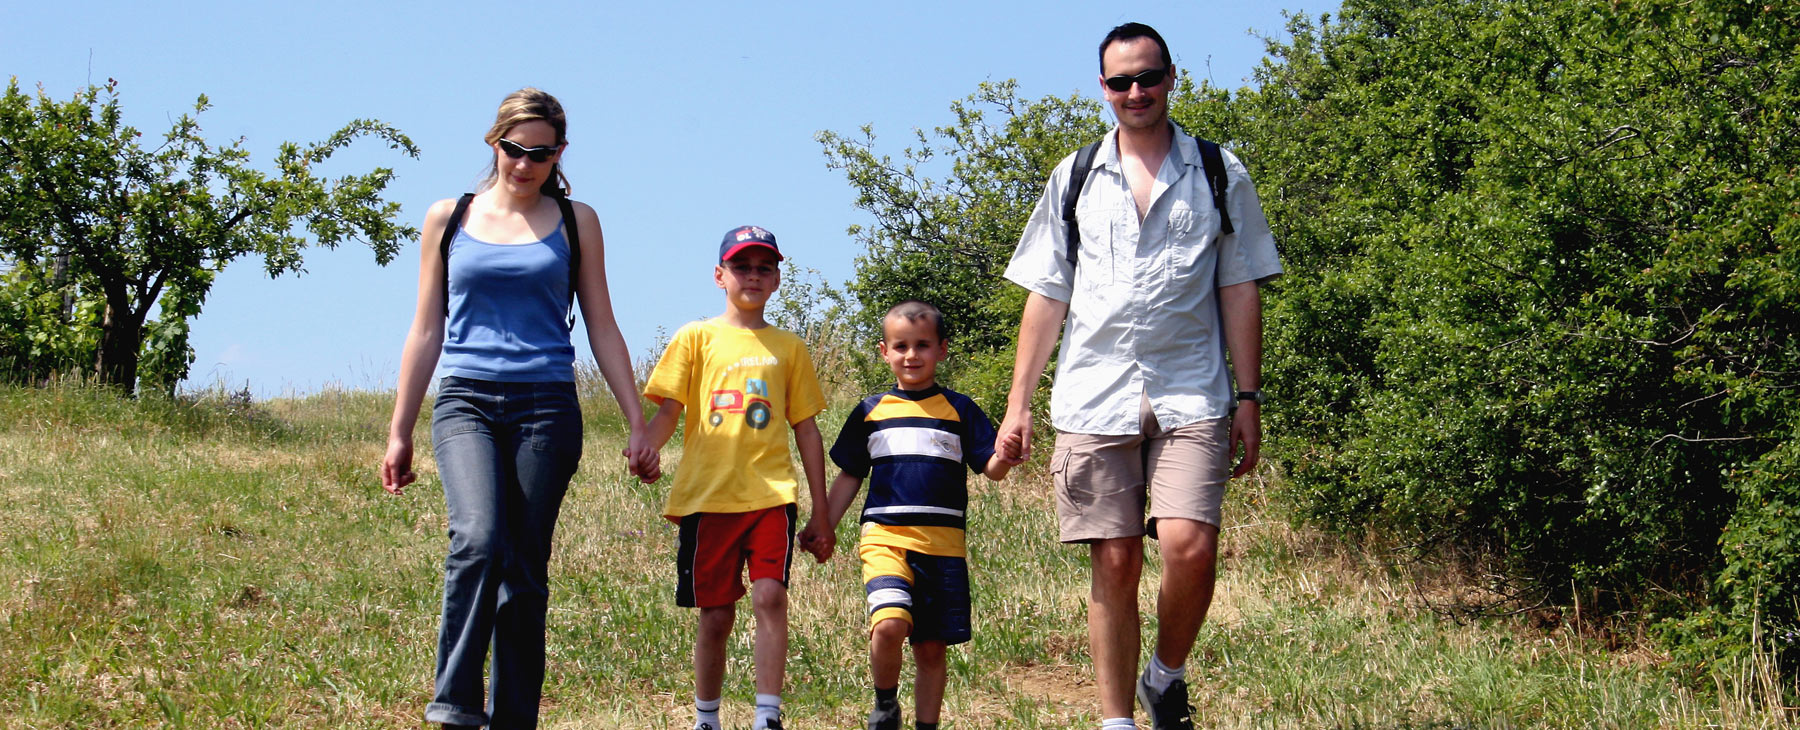 Sorties en famille rhone rhone tourisme visites for Sortie en famille yvelines